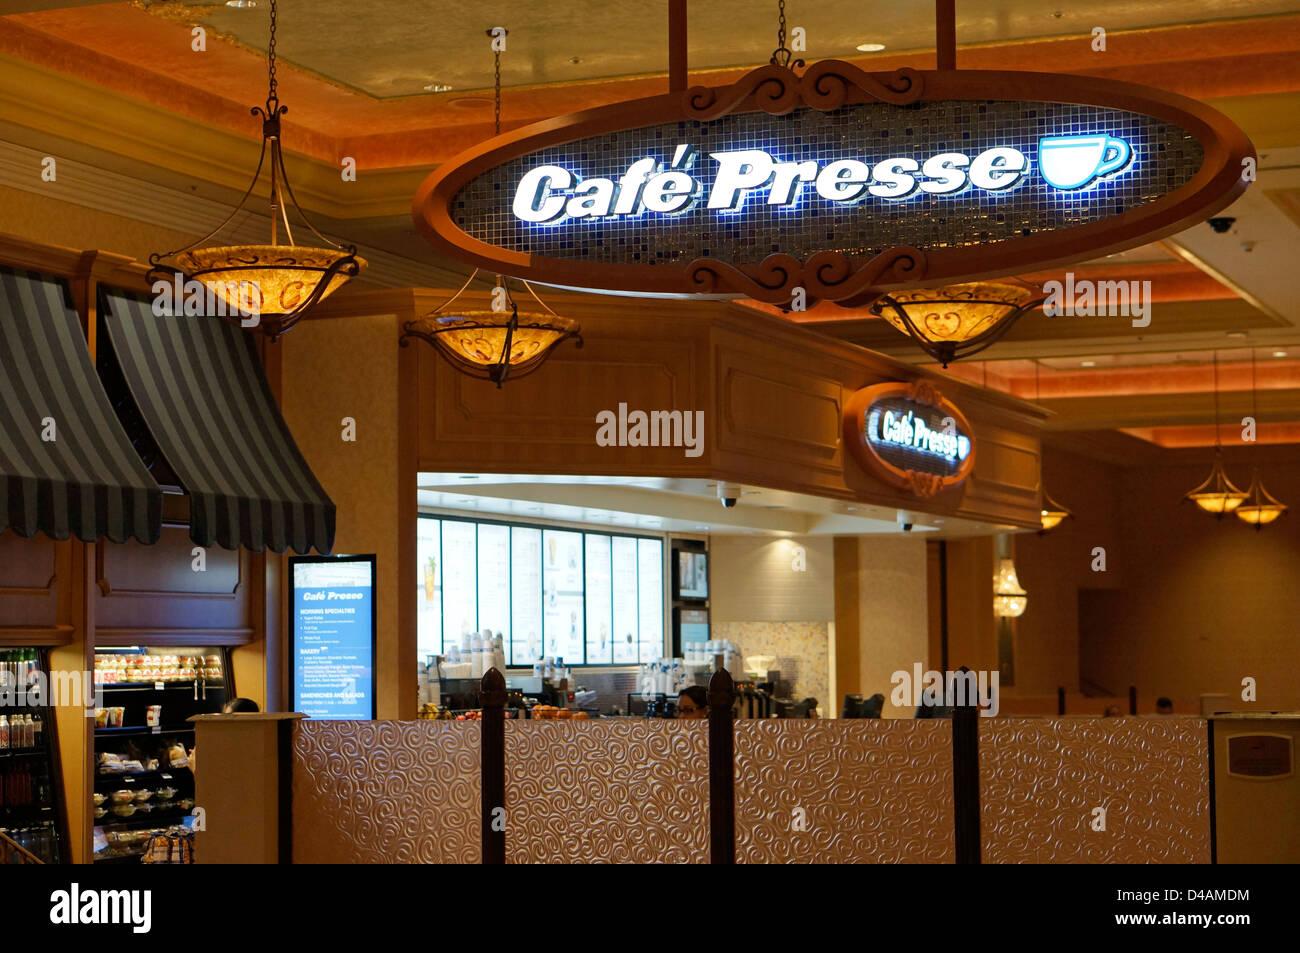 Cafe Presse in the Venetian, Las Vegas - Stock Image